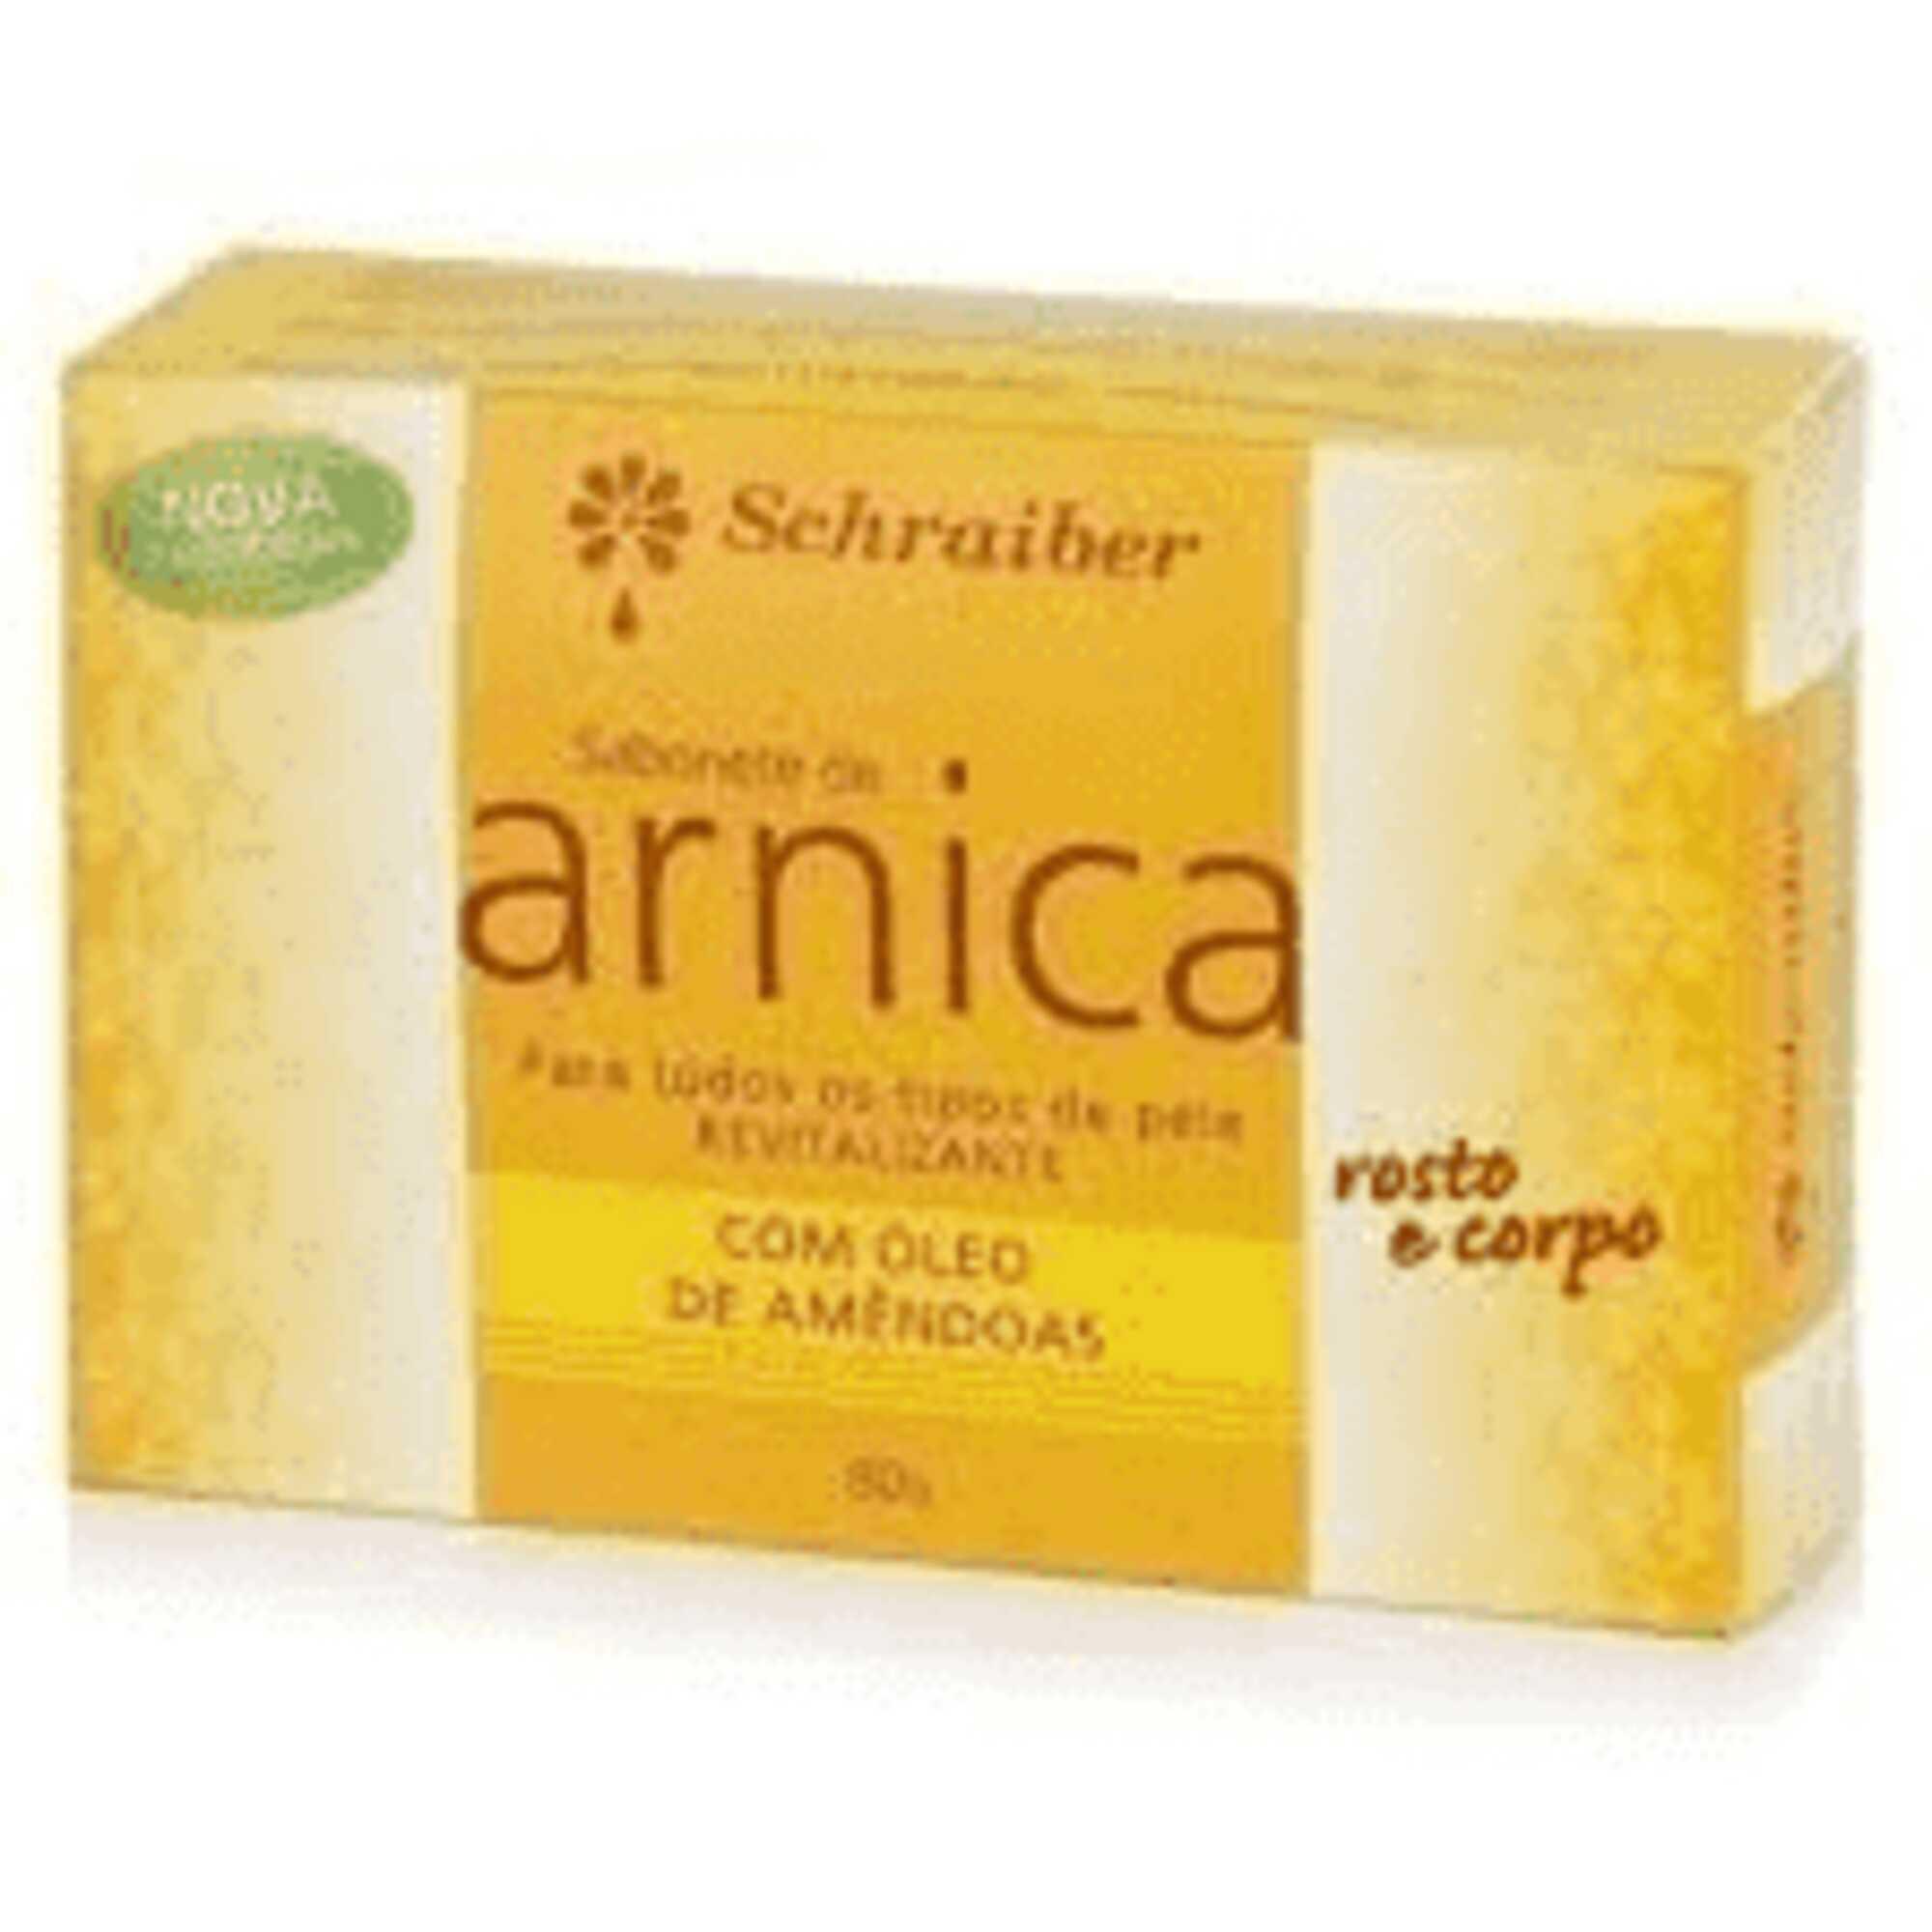 Sabonete de Arnica 80g Schraiber